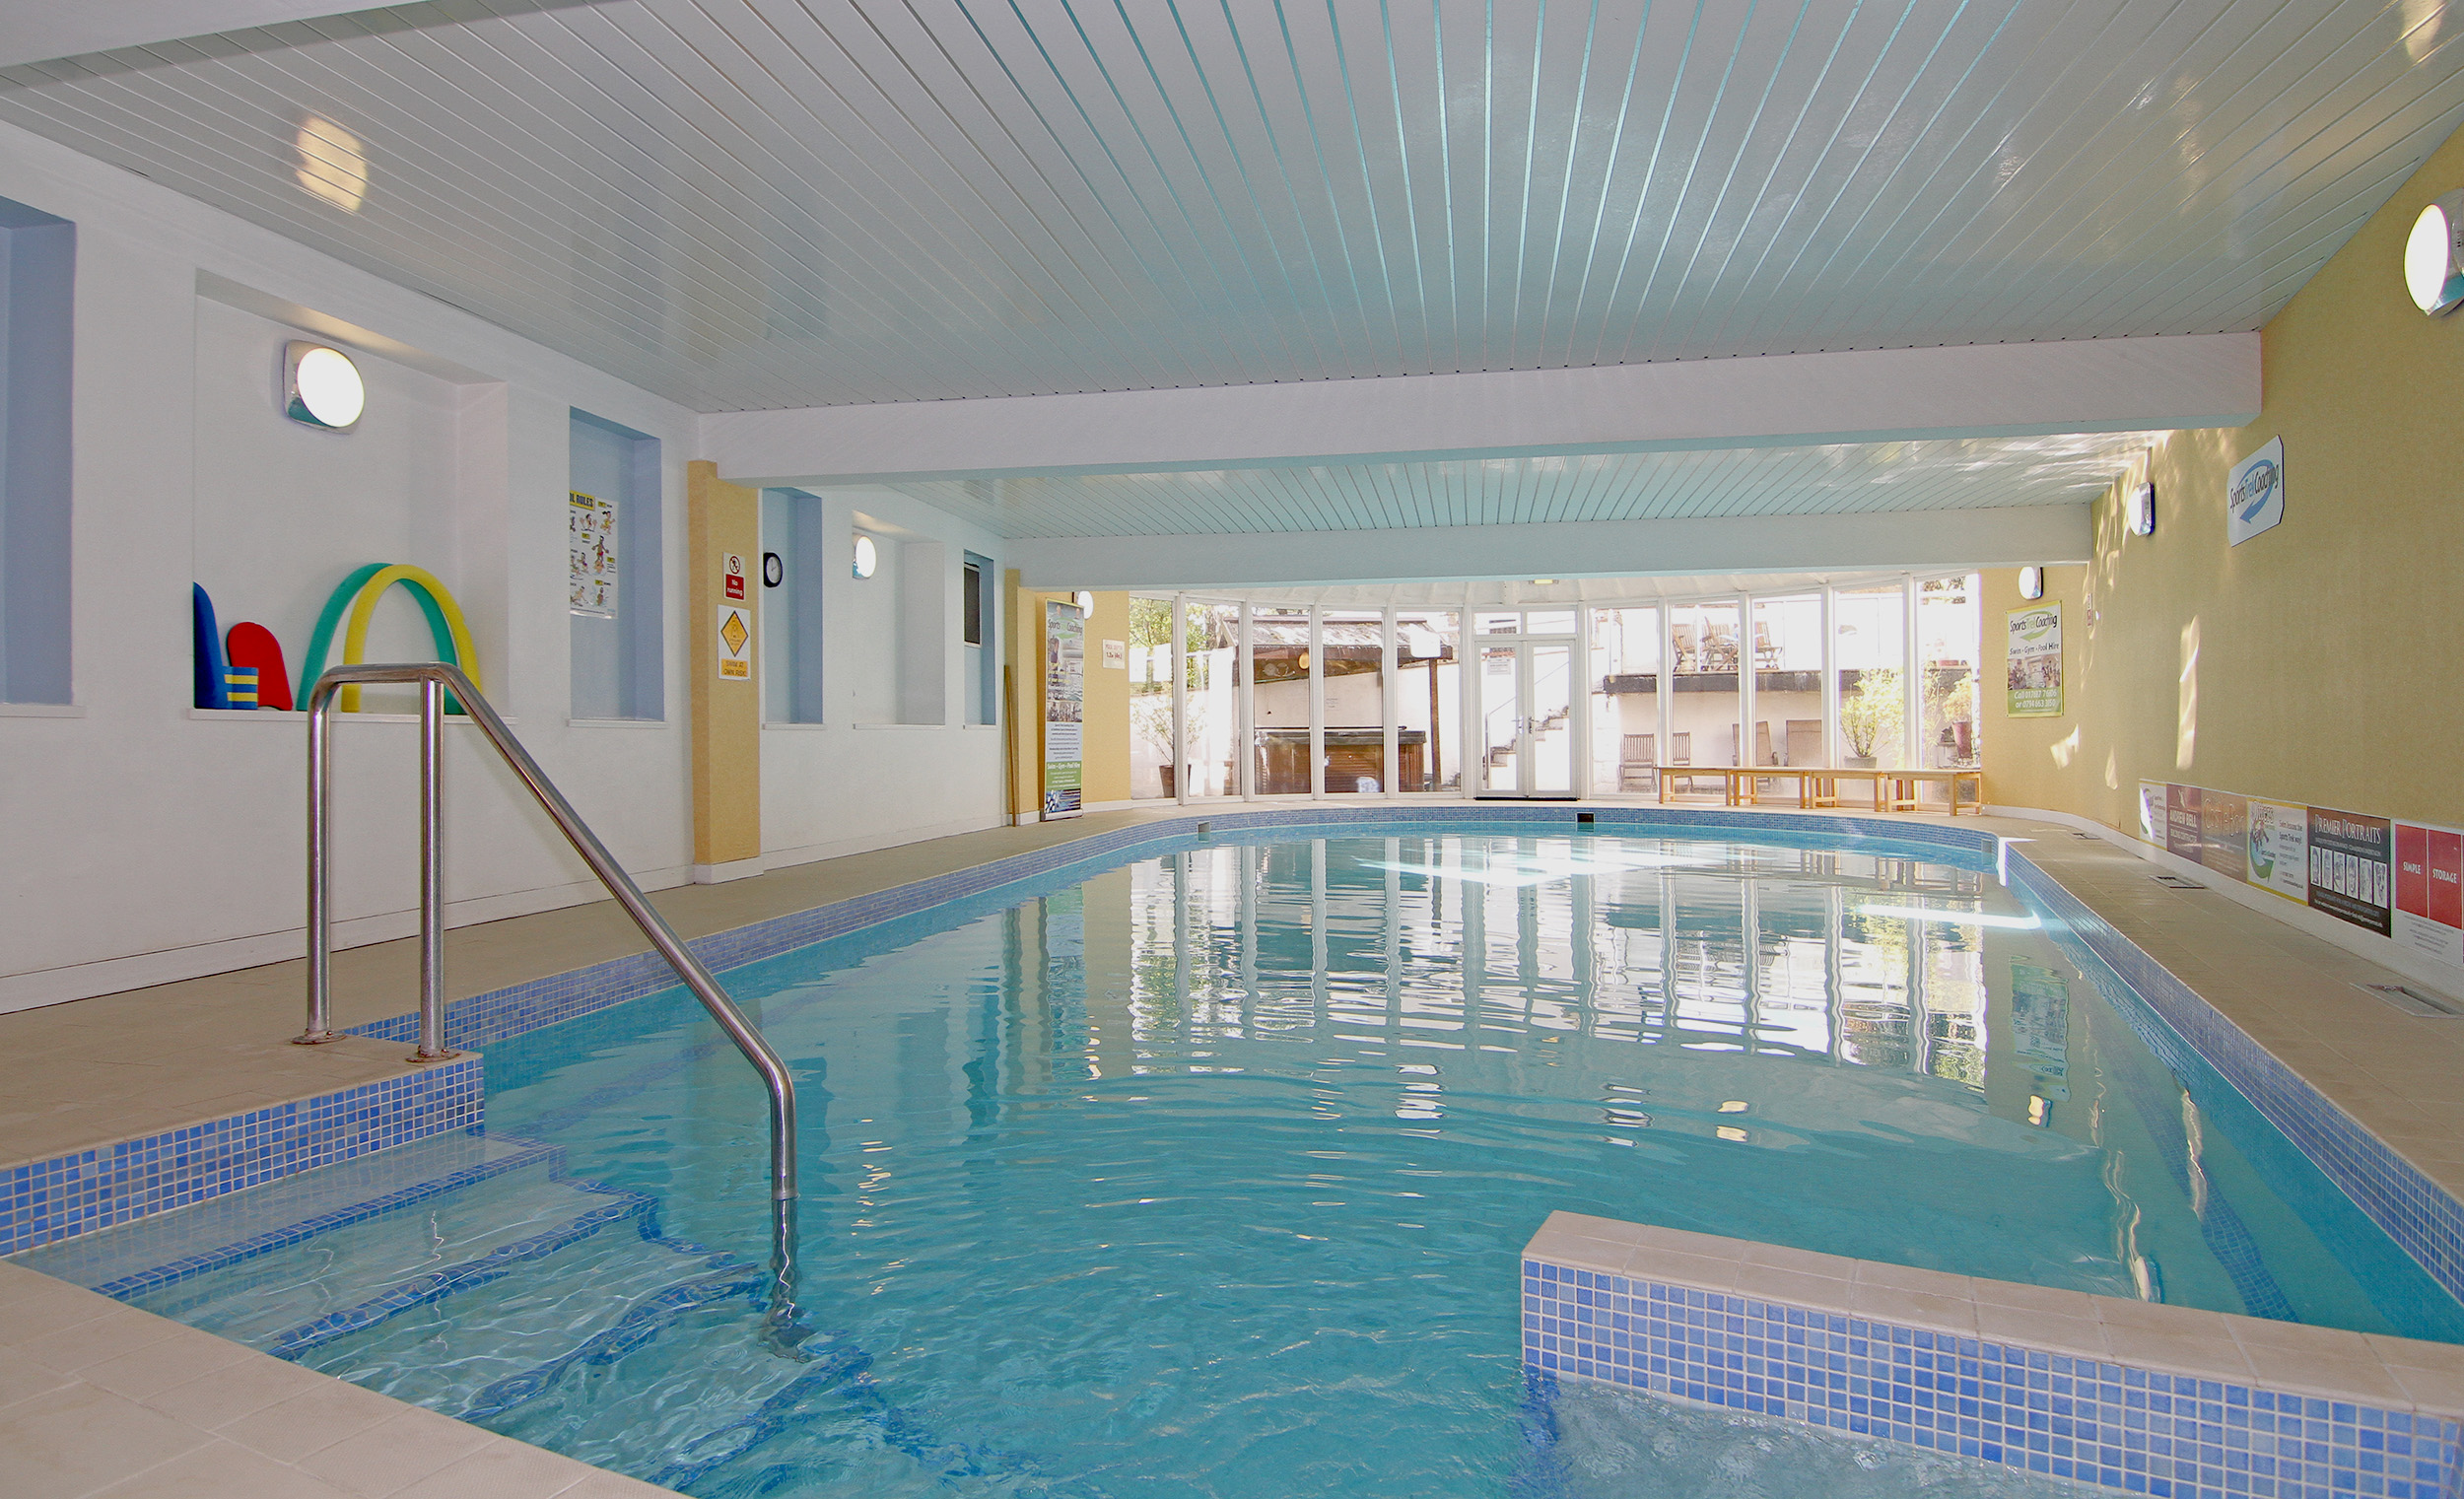 14m indoor swimming pool